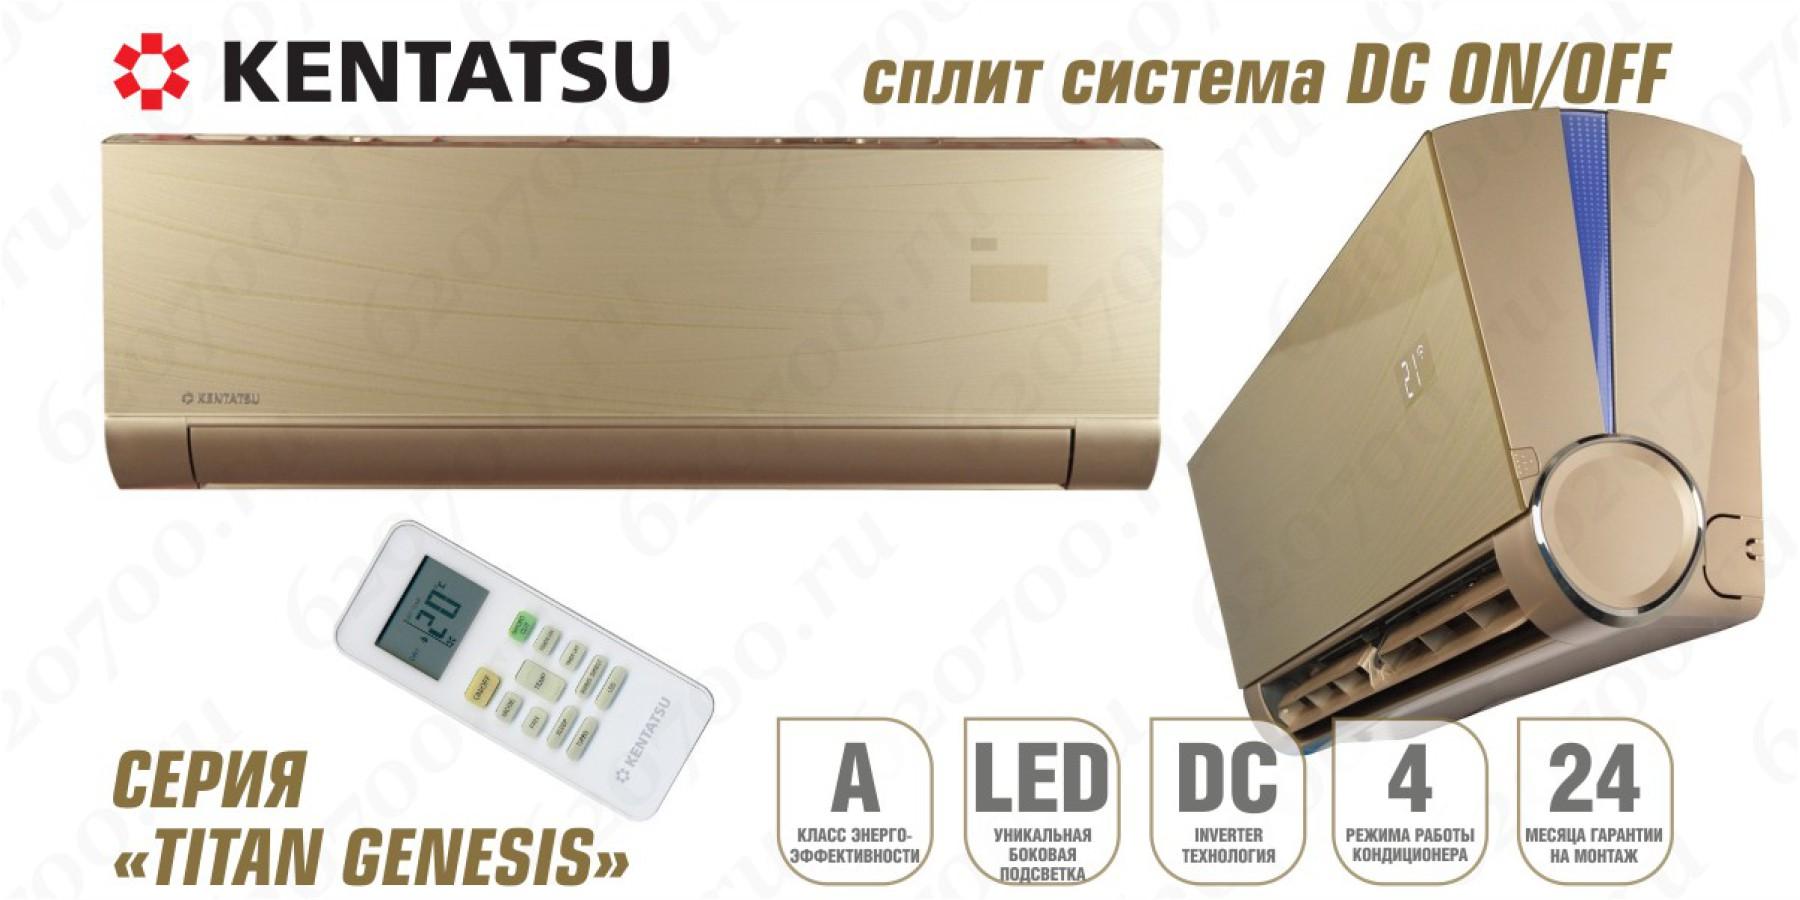 Сплит-система KENTATSU KSGX26HFAN1 / KSRX26HFAN1 цвет золотистый